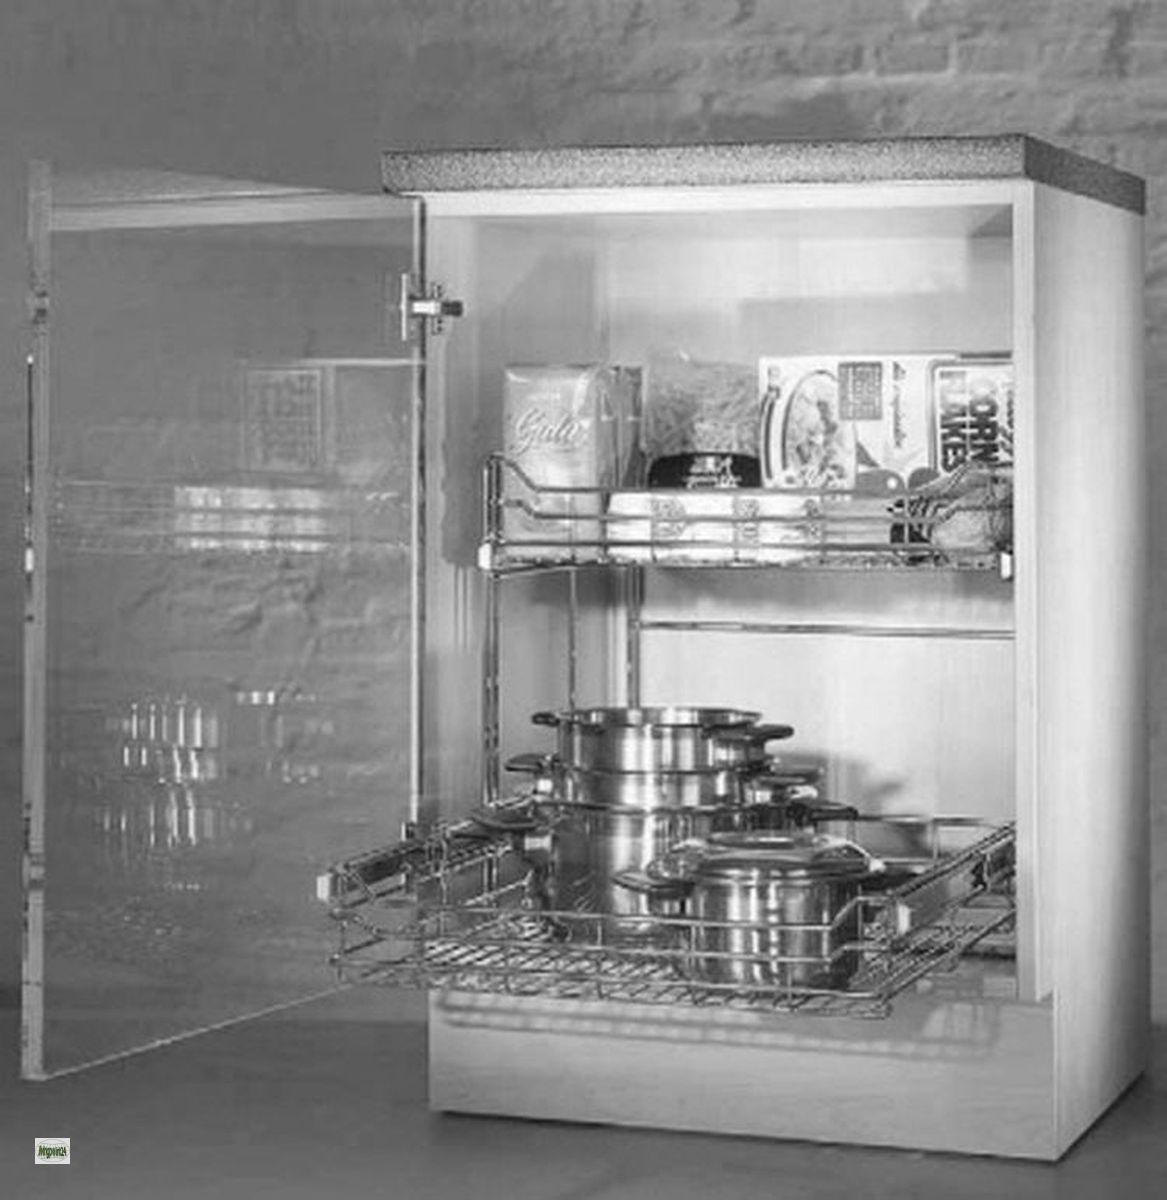 Wesco quickbasket teleskopauszug schrankauszug 40er for Schrankauszug küche